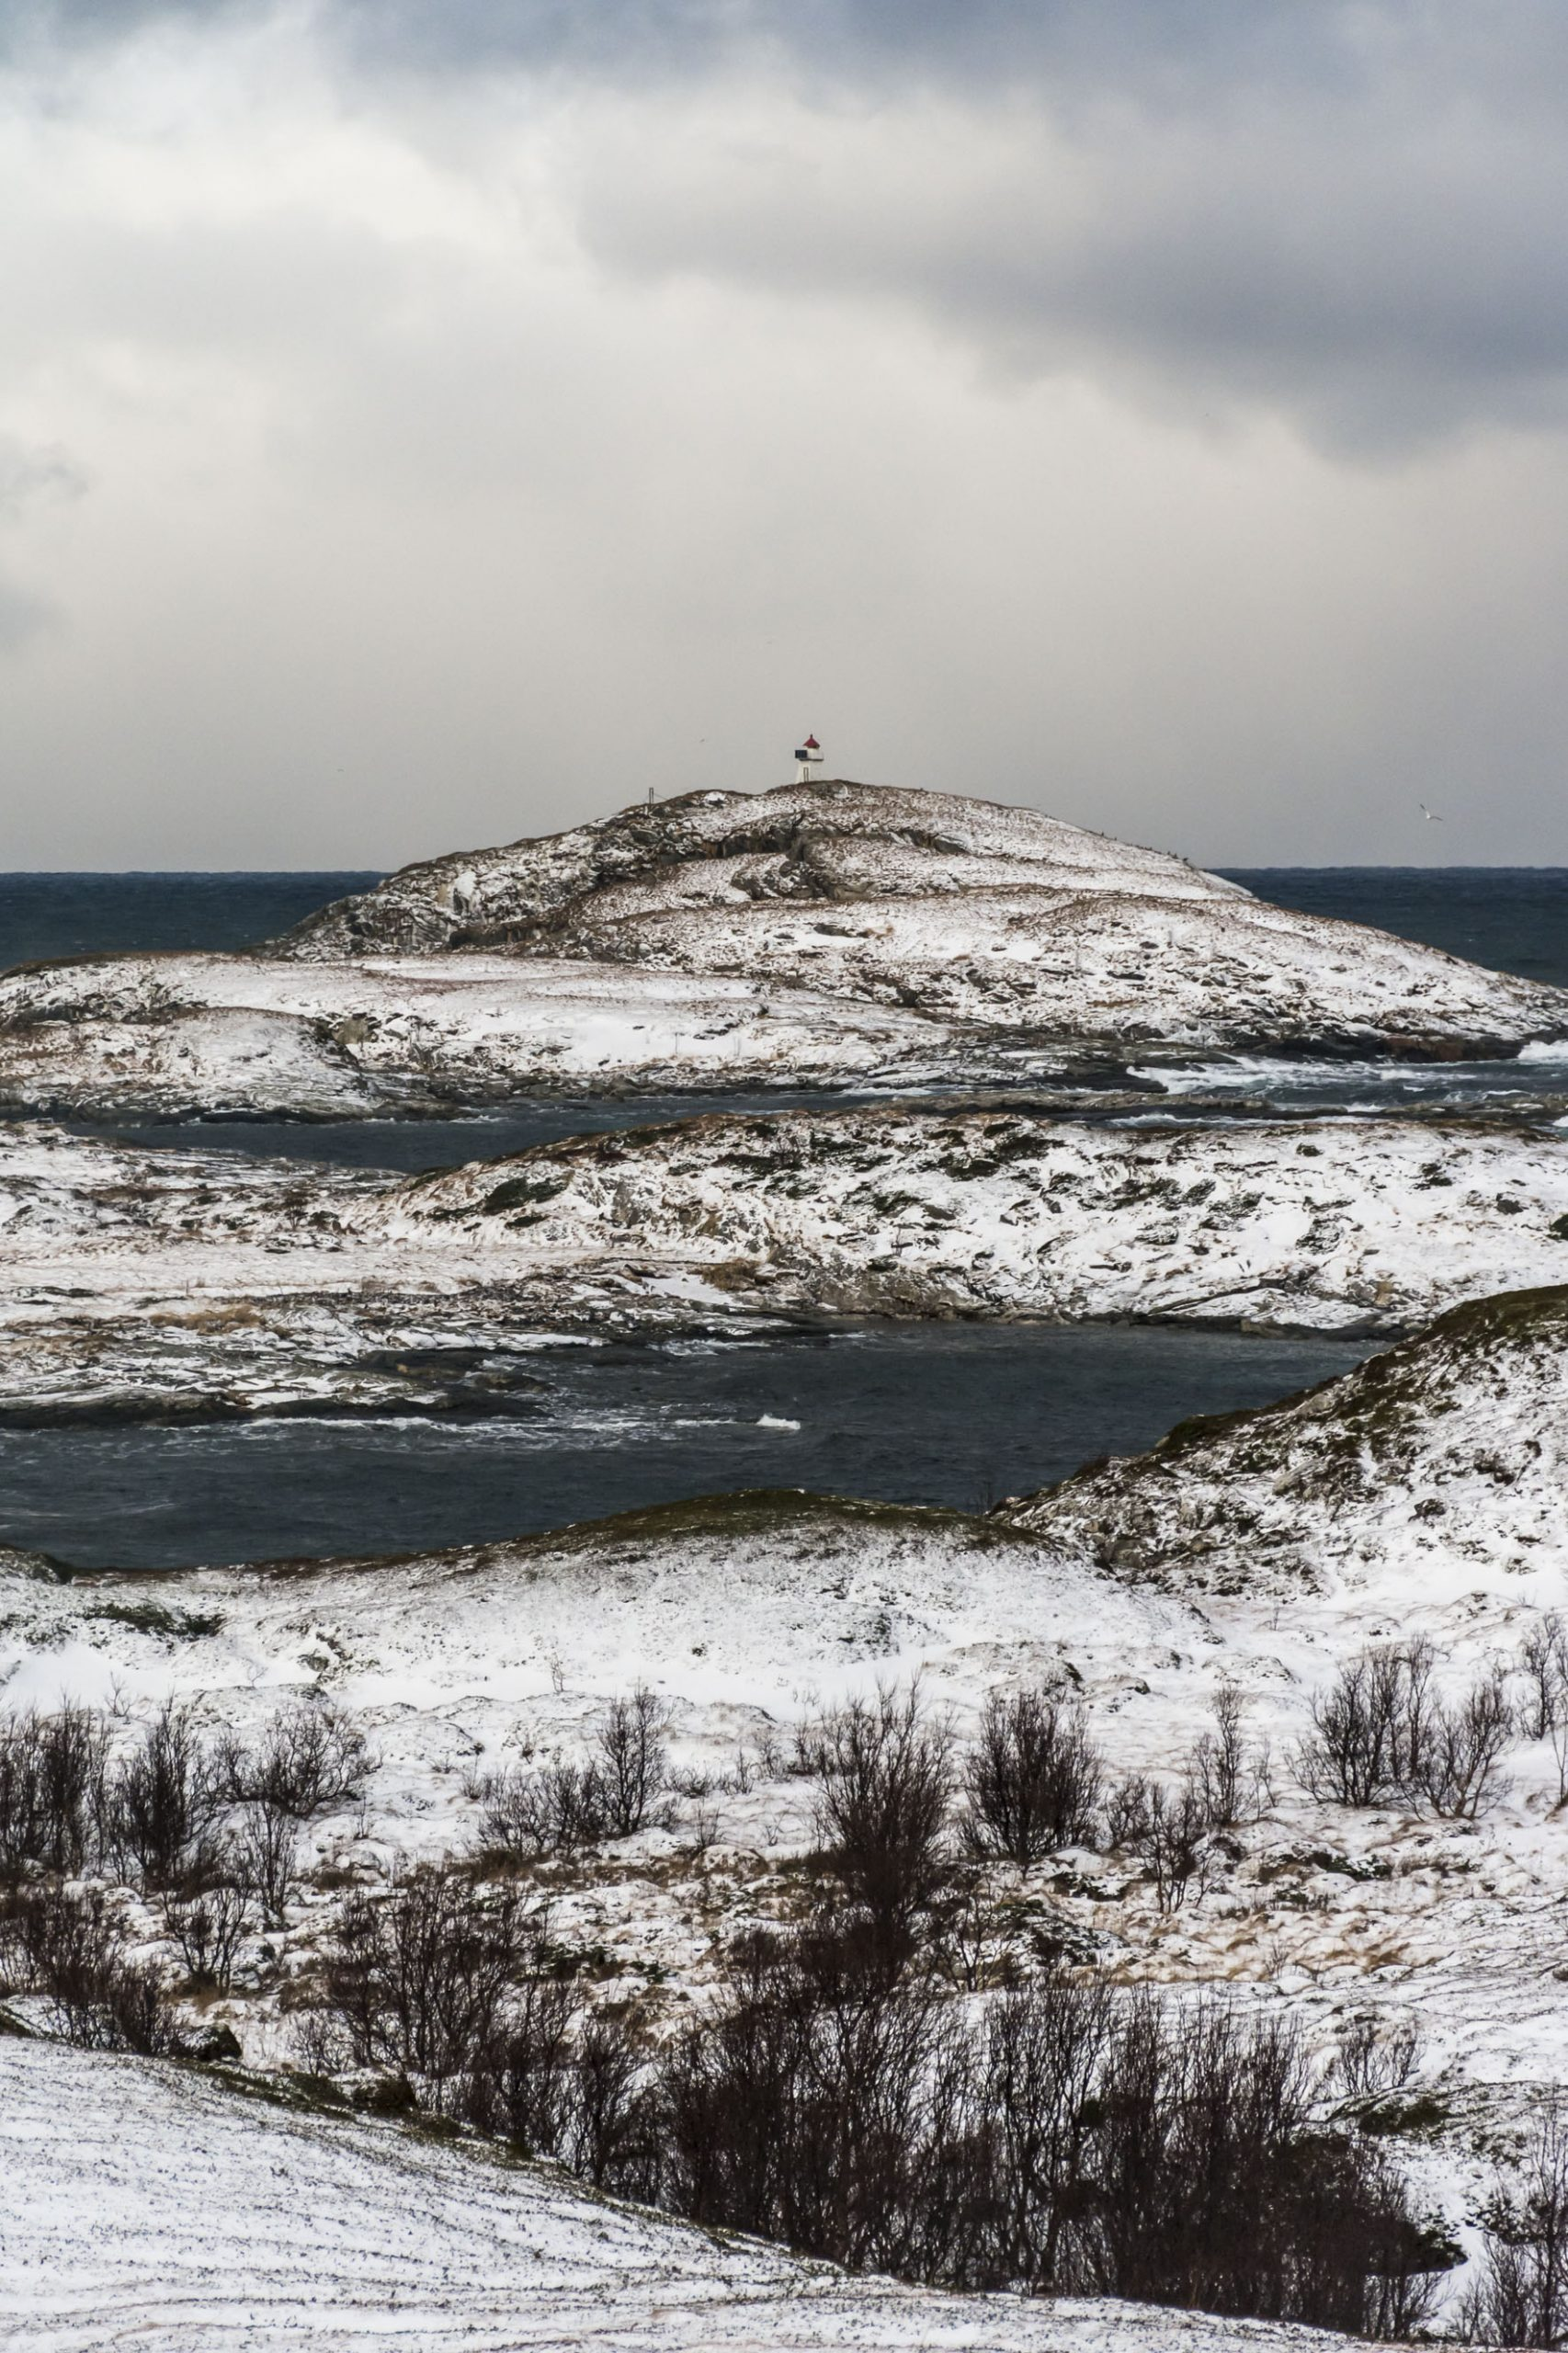 Le phare de Sommarøy